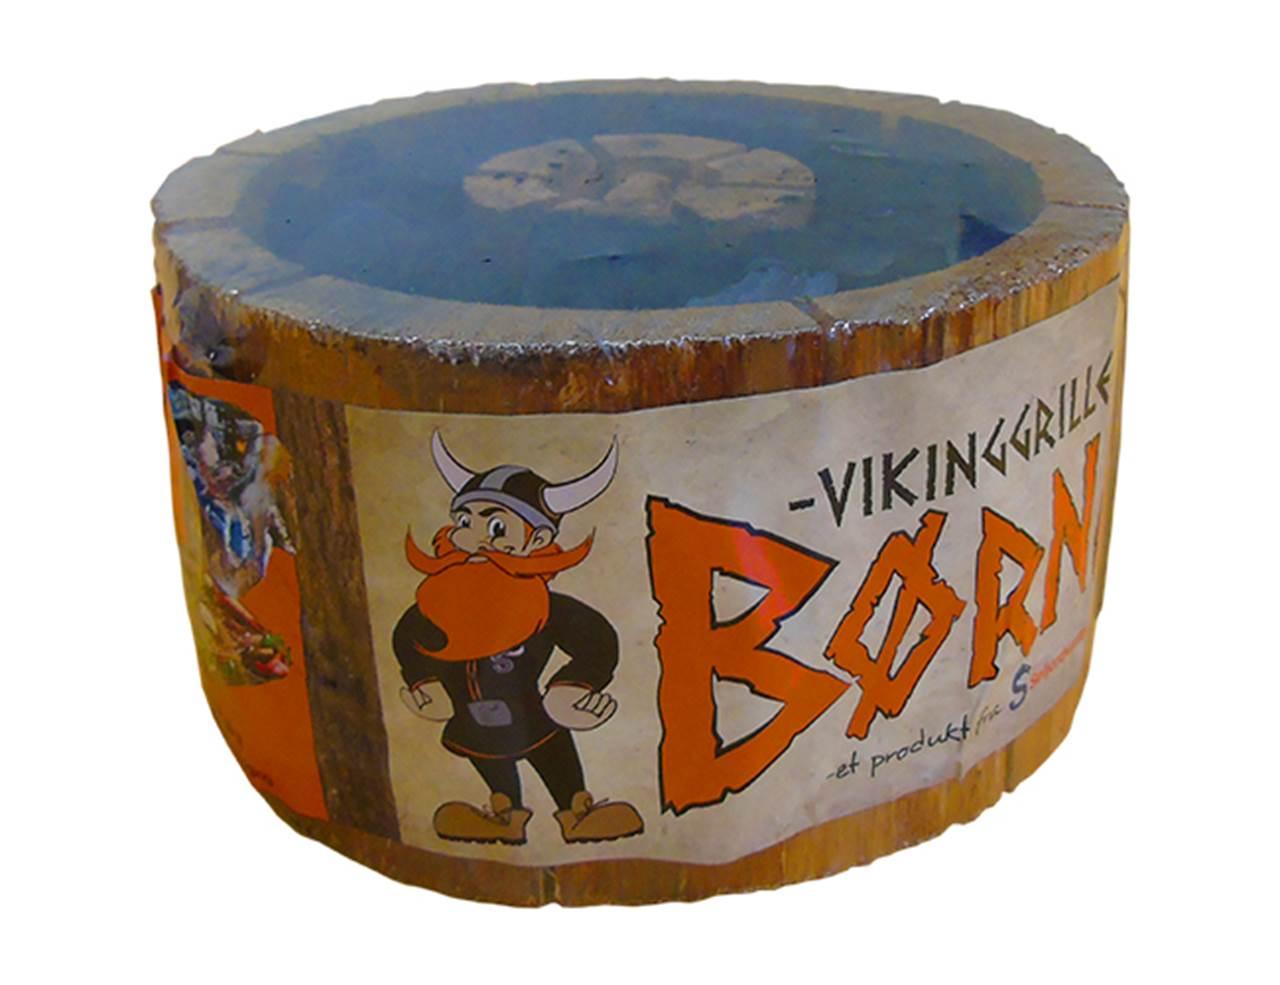 Børni vikingrill